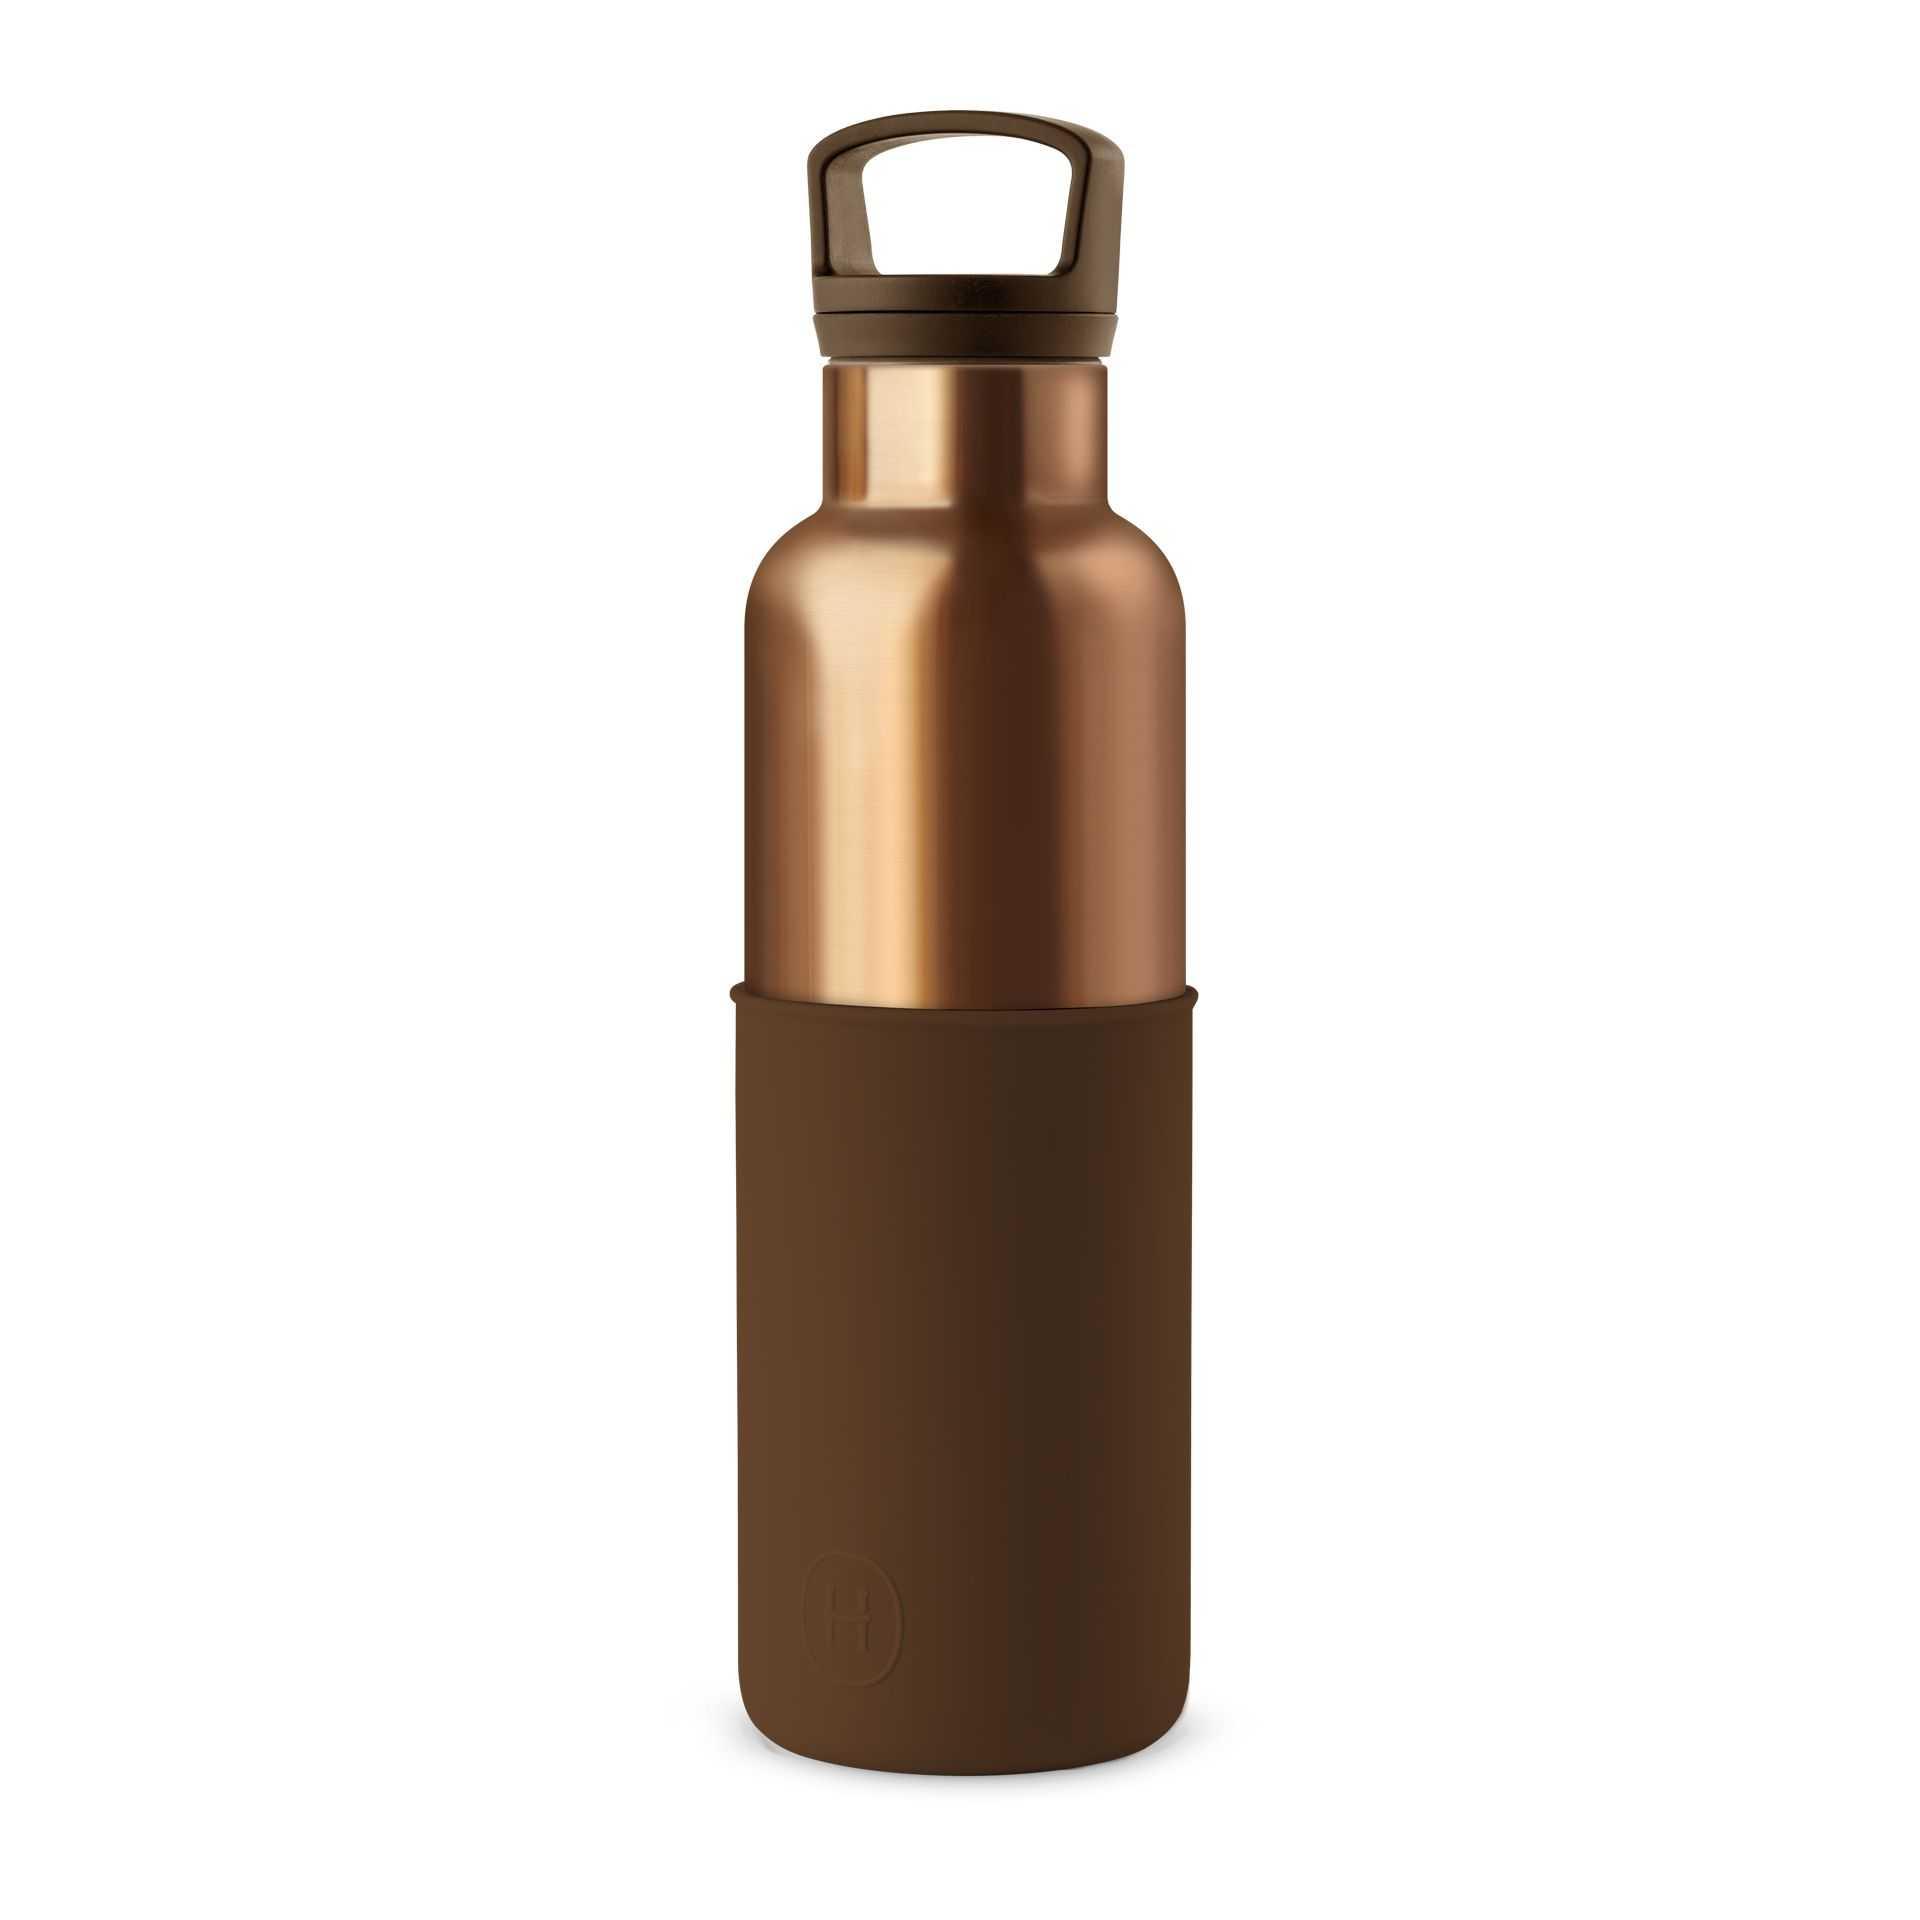 【HYDY】摩卡-古銅金瓶 590ml